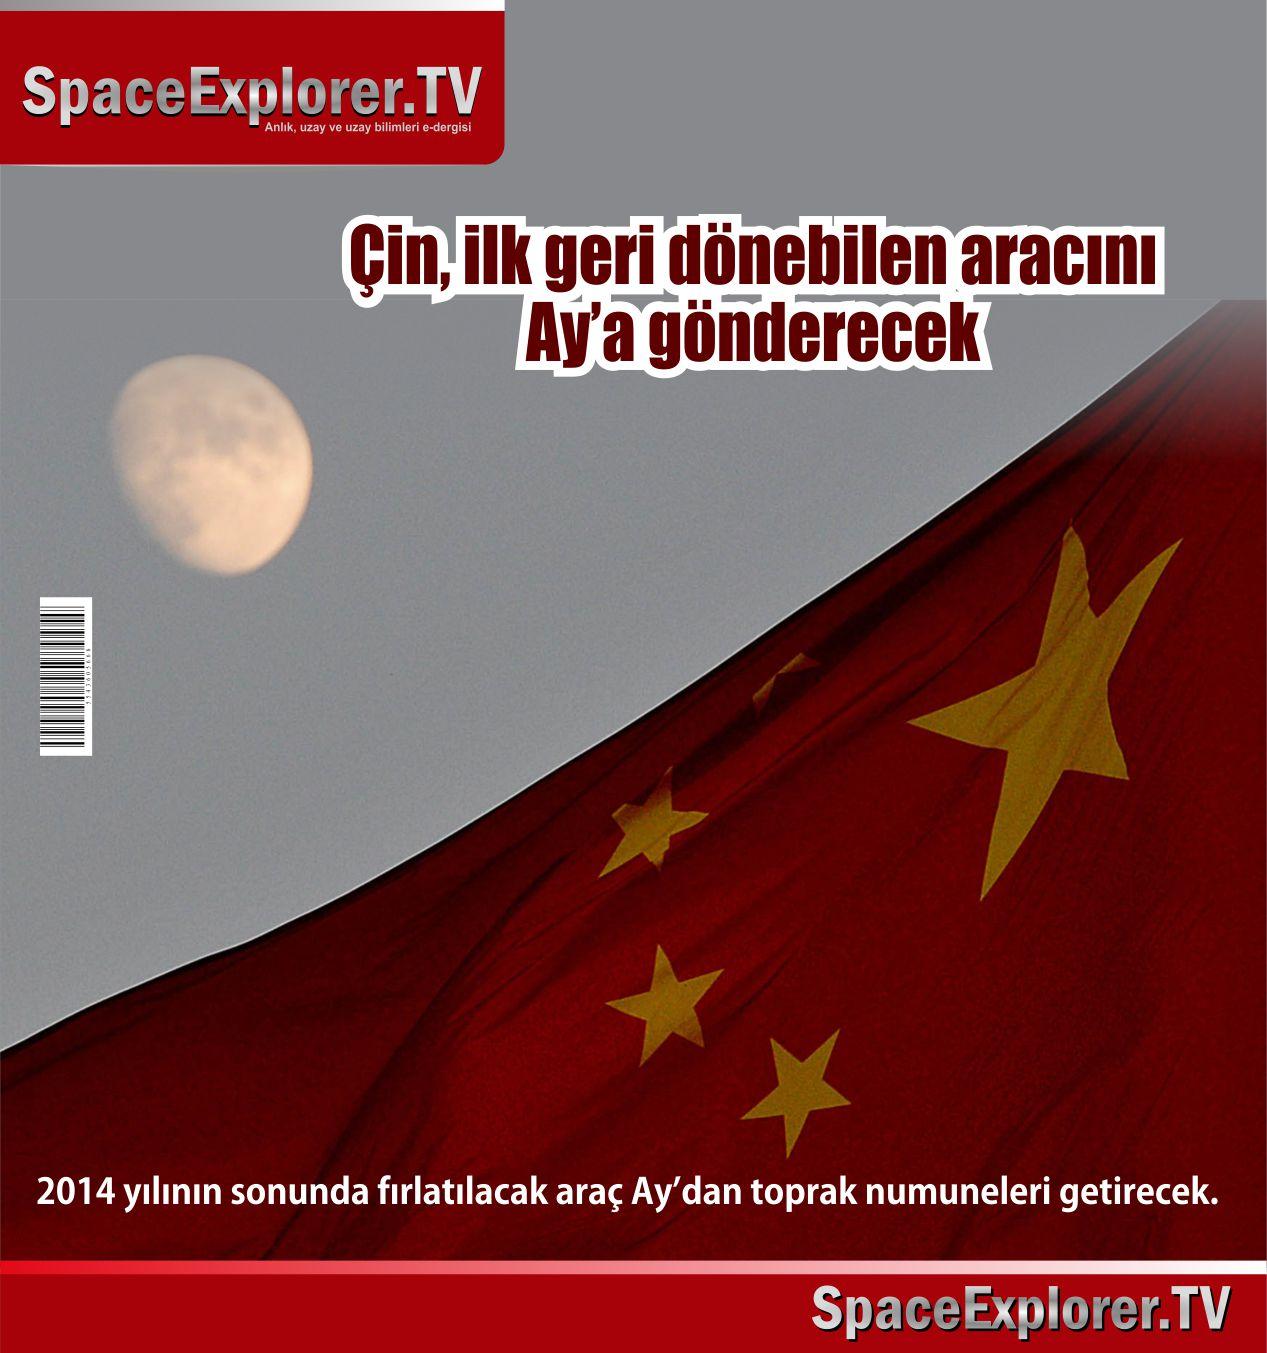 Çin, Ay, Ay'da üs, Çin uzay çalışmaları, Space Explorer,